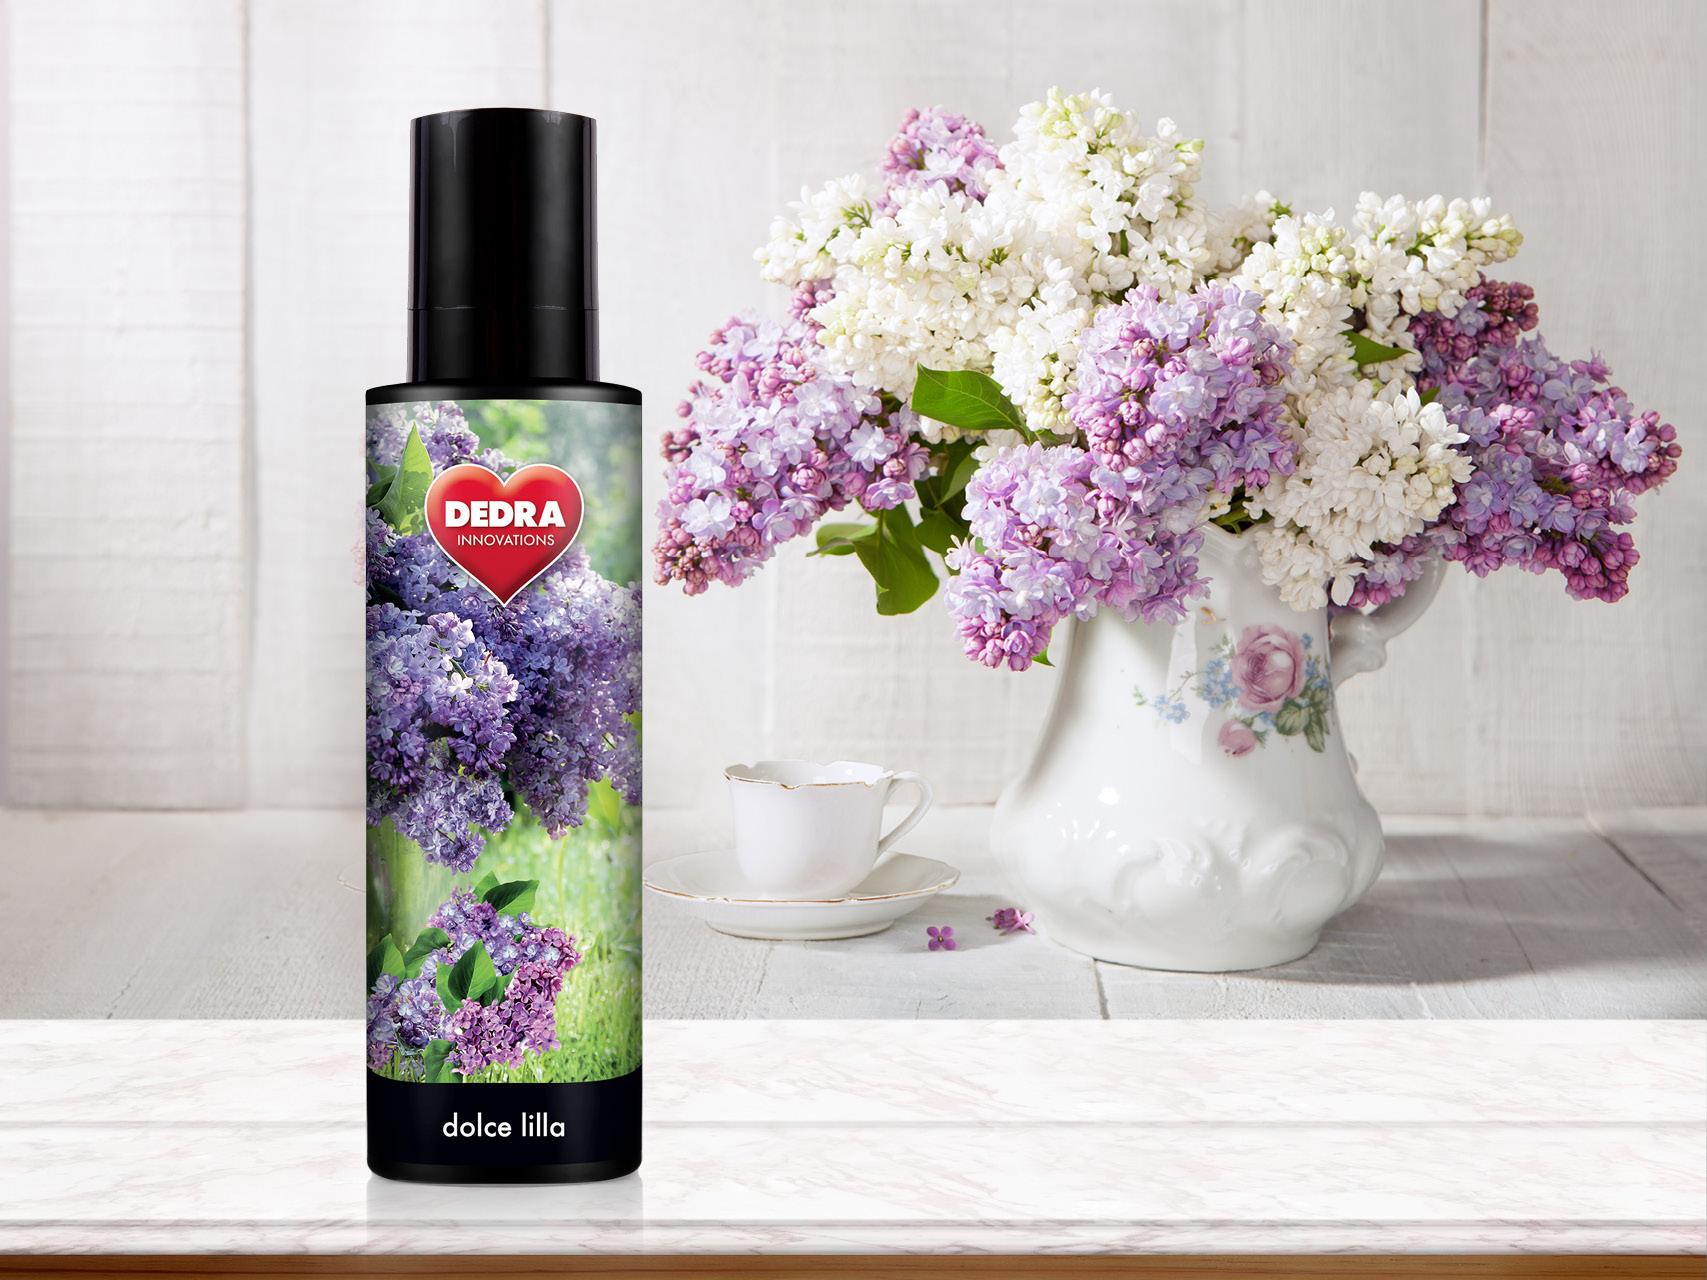 HP0437-PARFUM air & textiles spray dolce lilla osviežovač vzduchu 250 ml